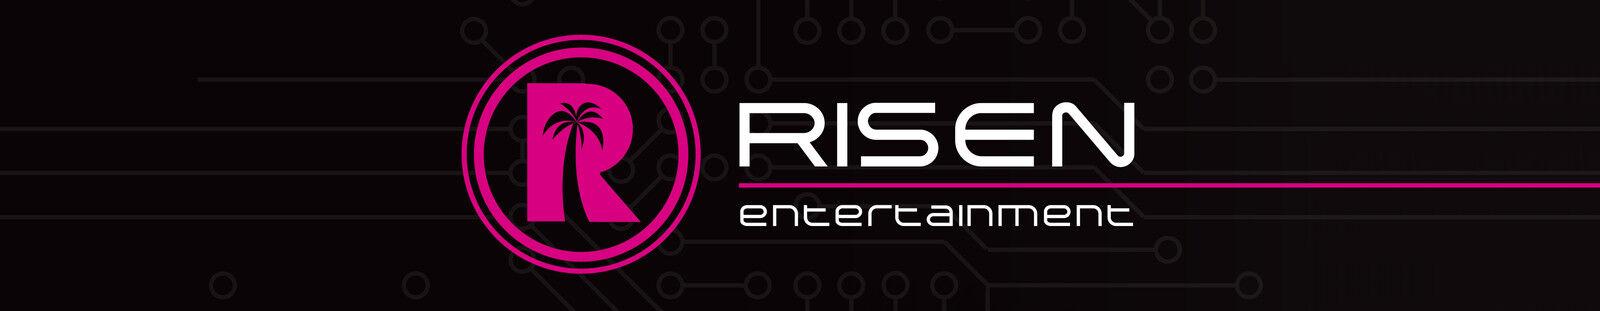 Risen Entertainment